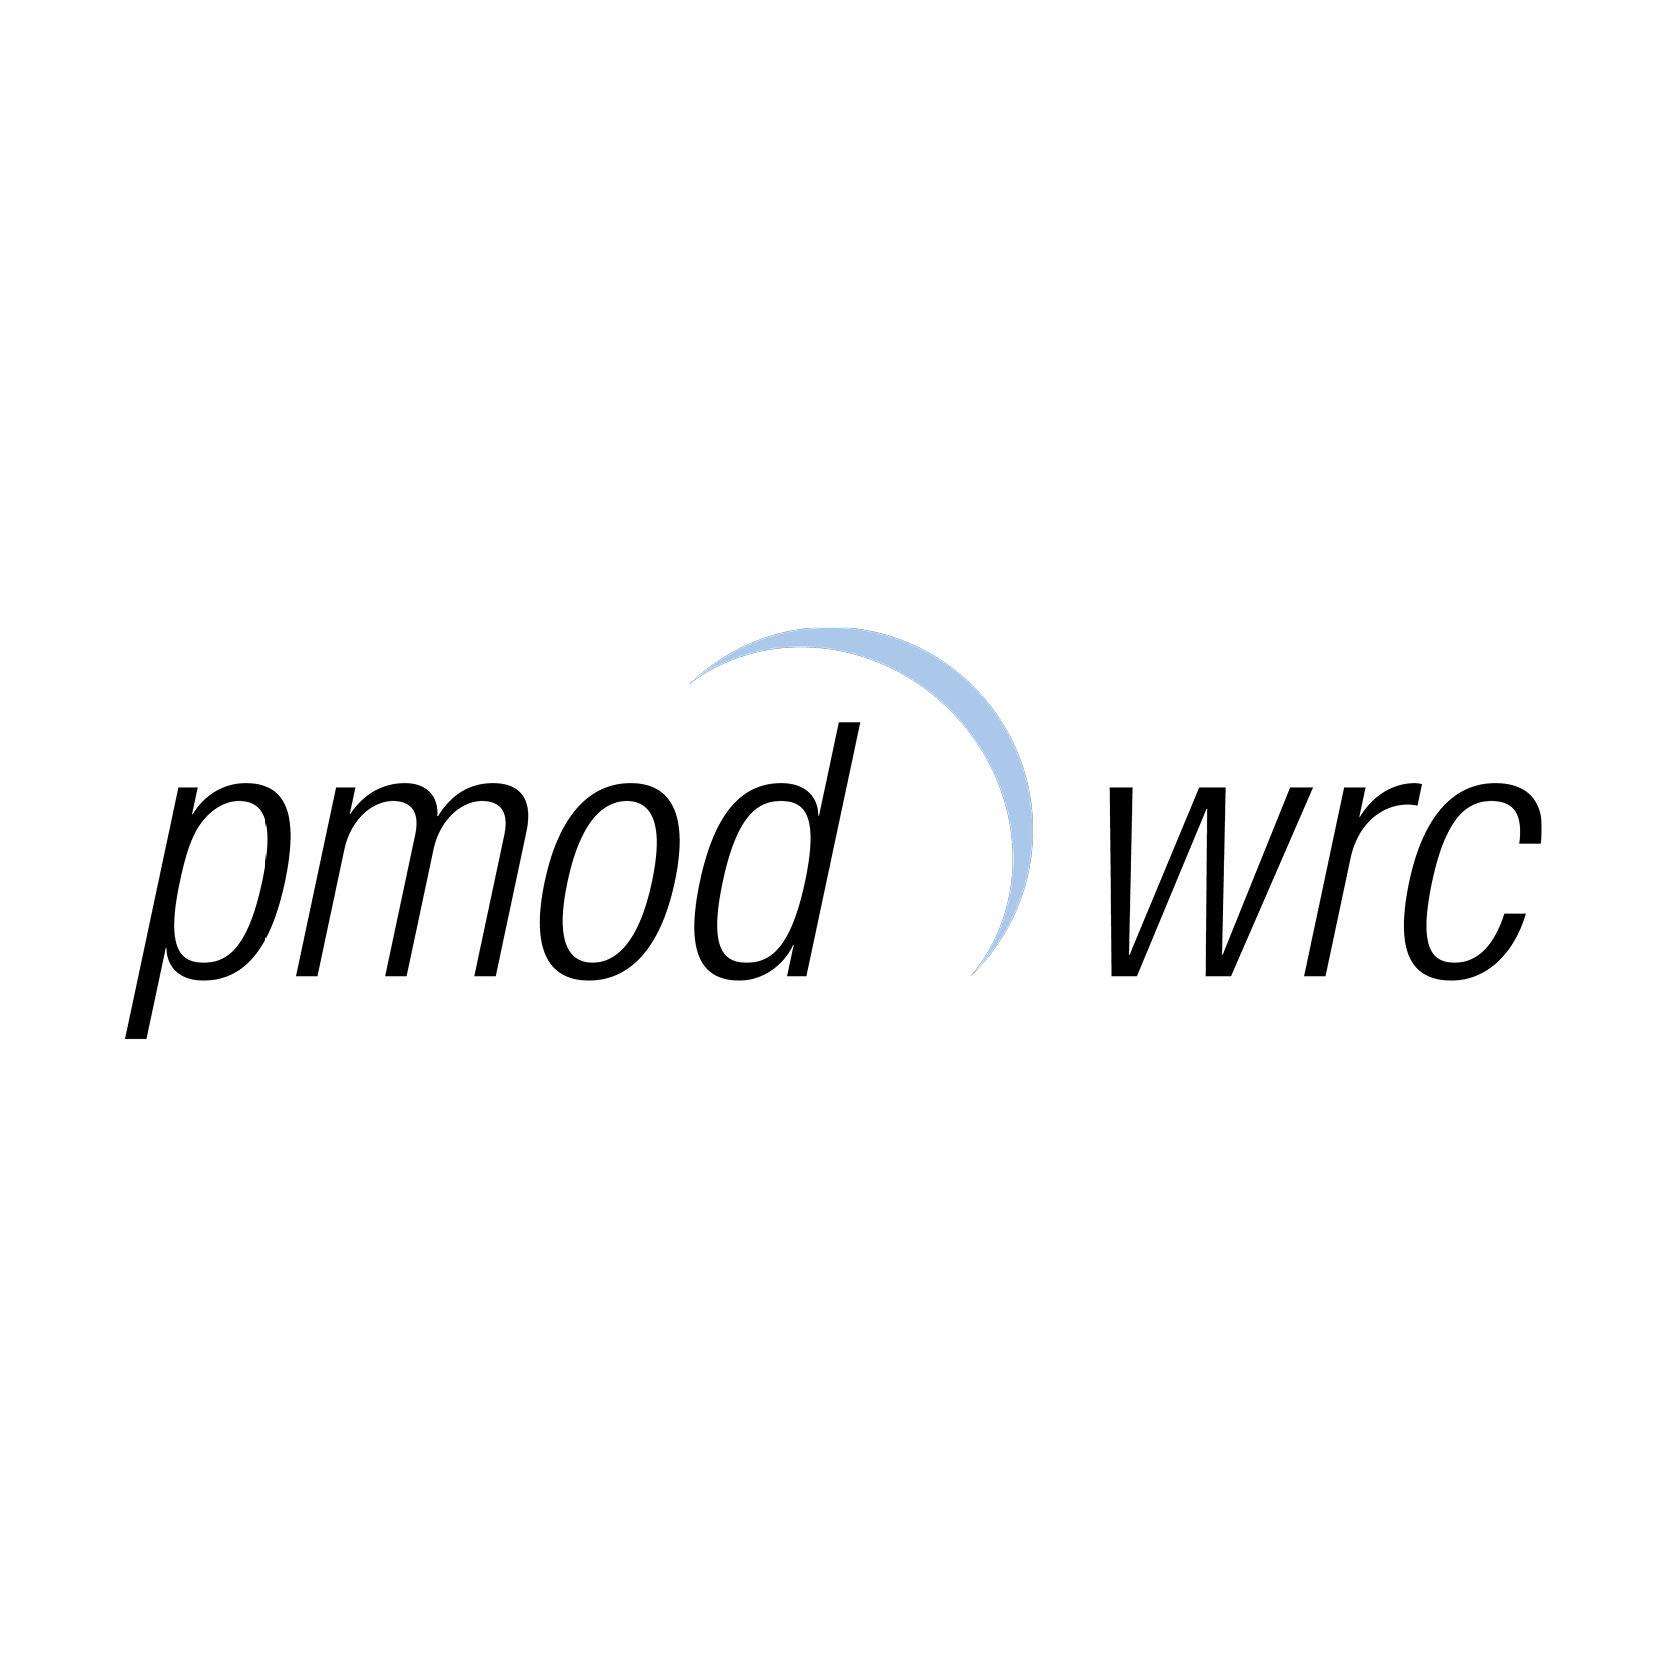 PMOD/WRC